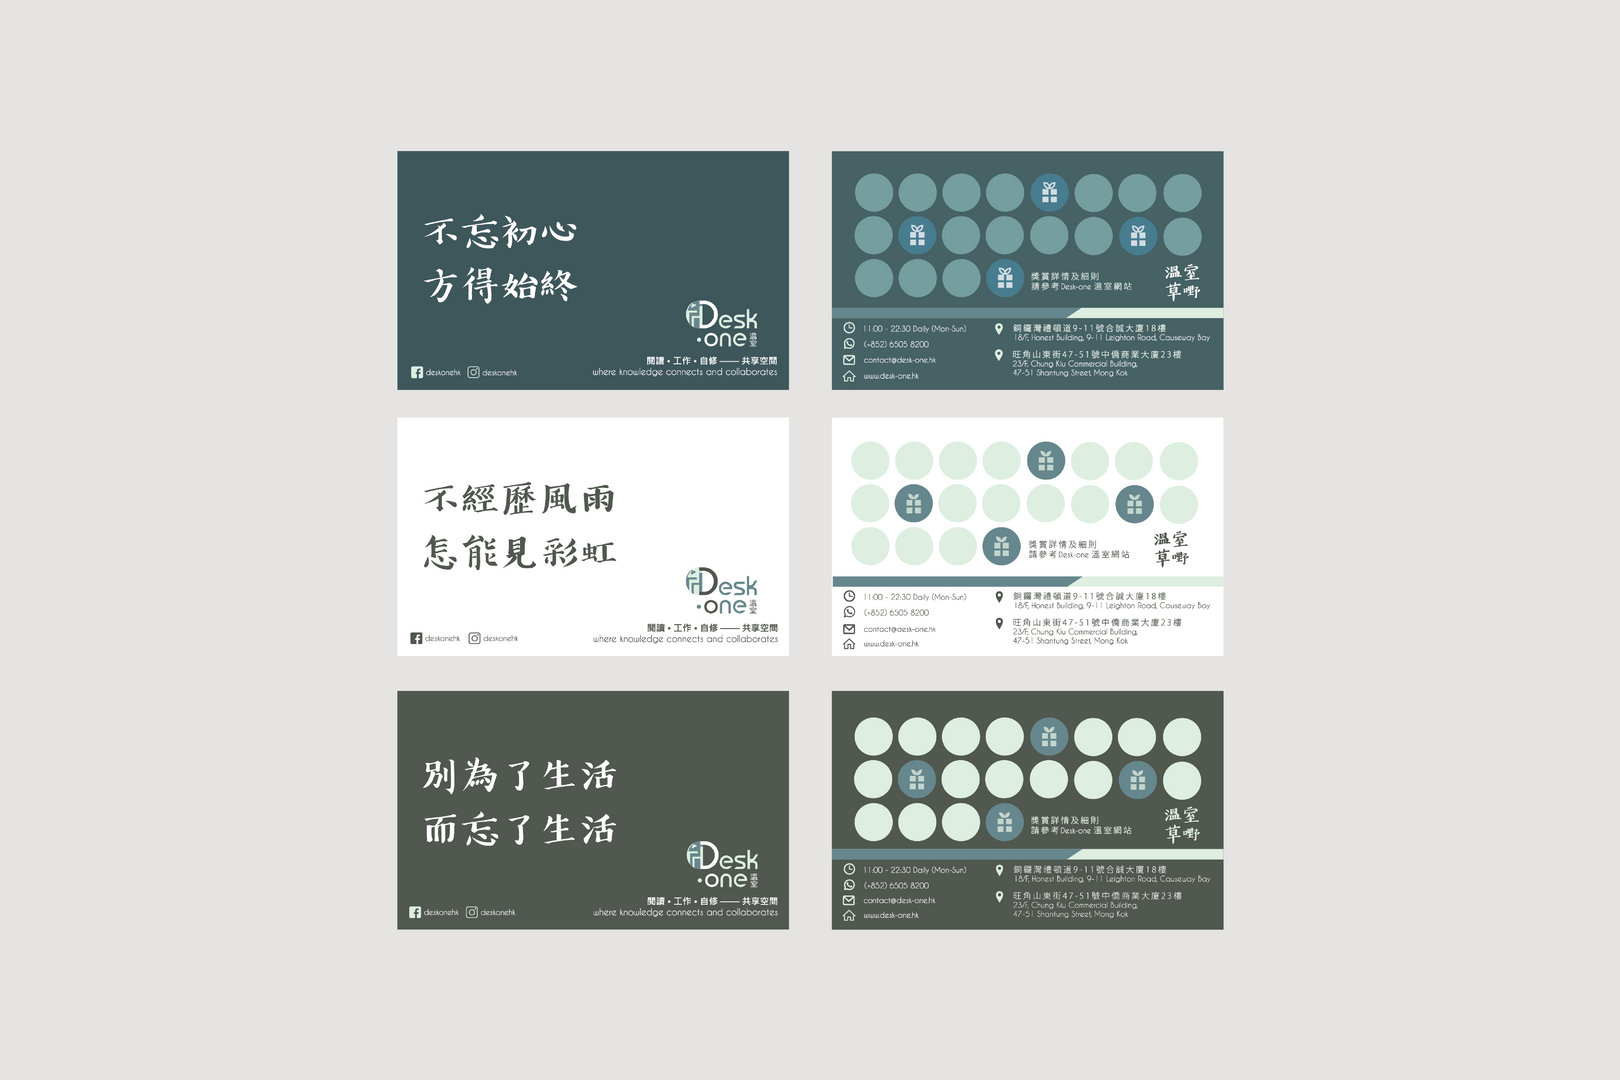 Desk-one-Portfolio-01.png